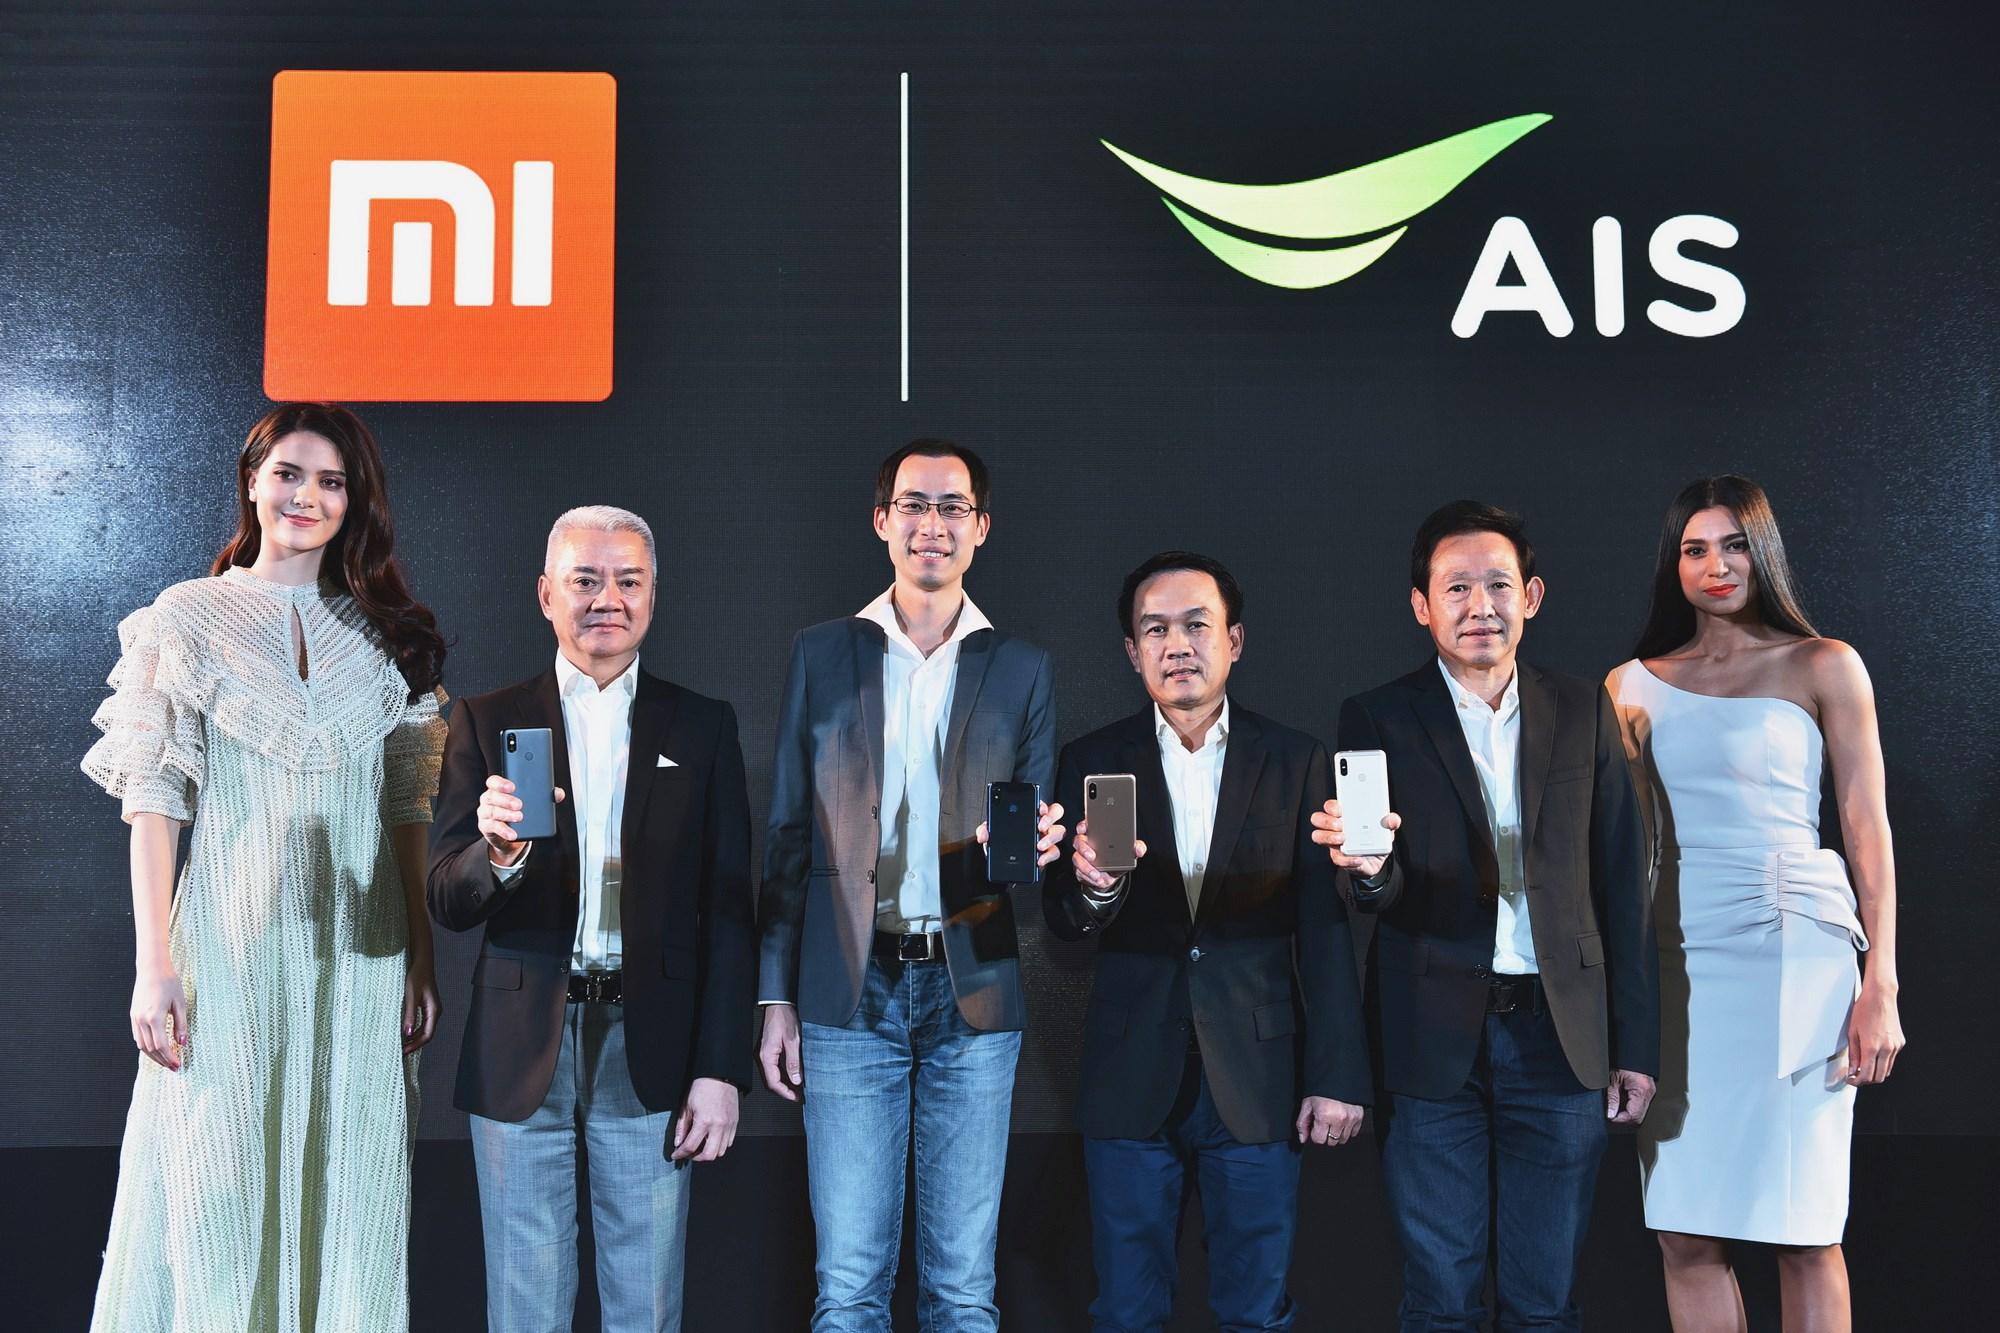 Xiaomi X AIS